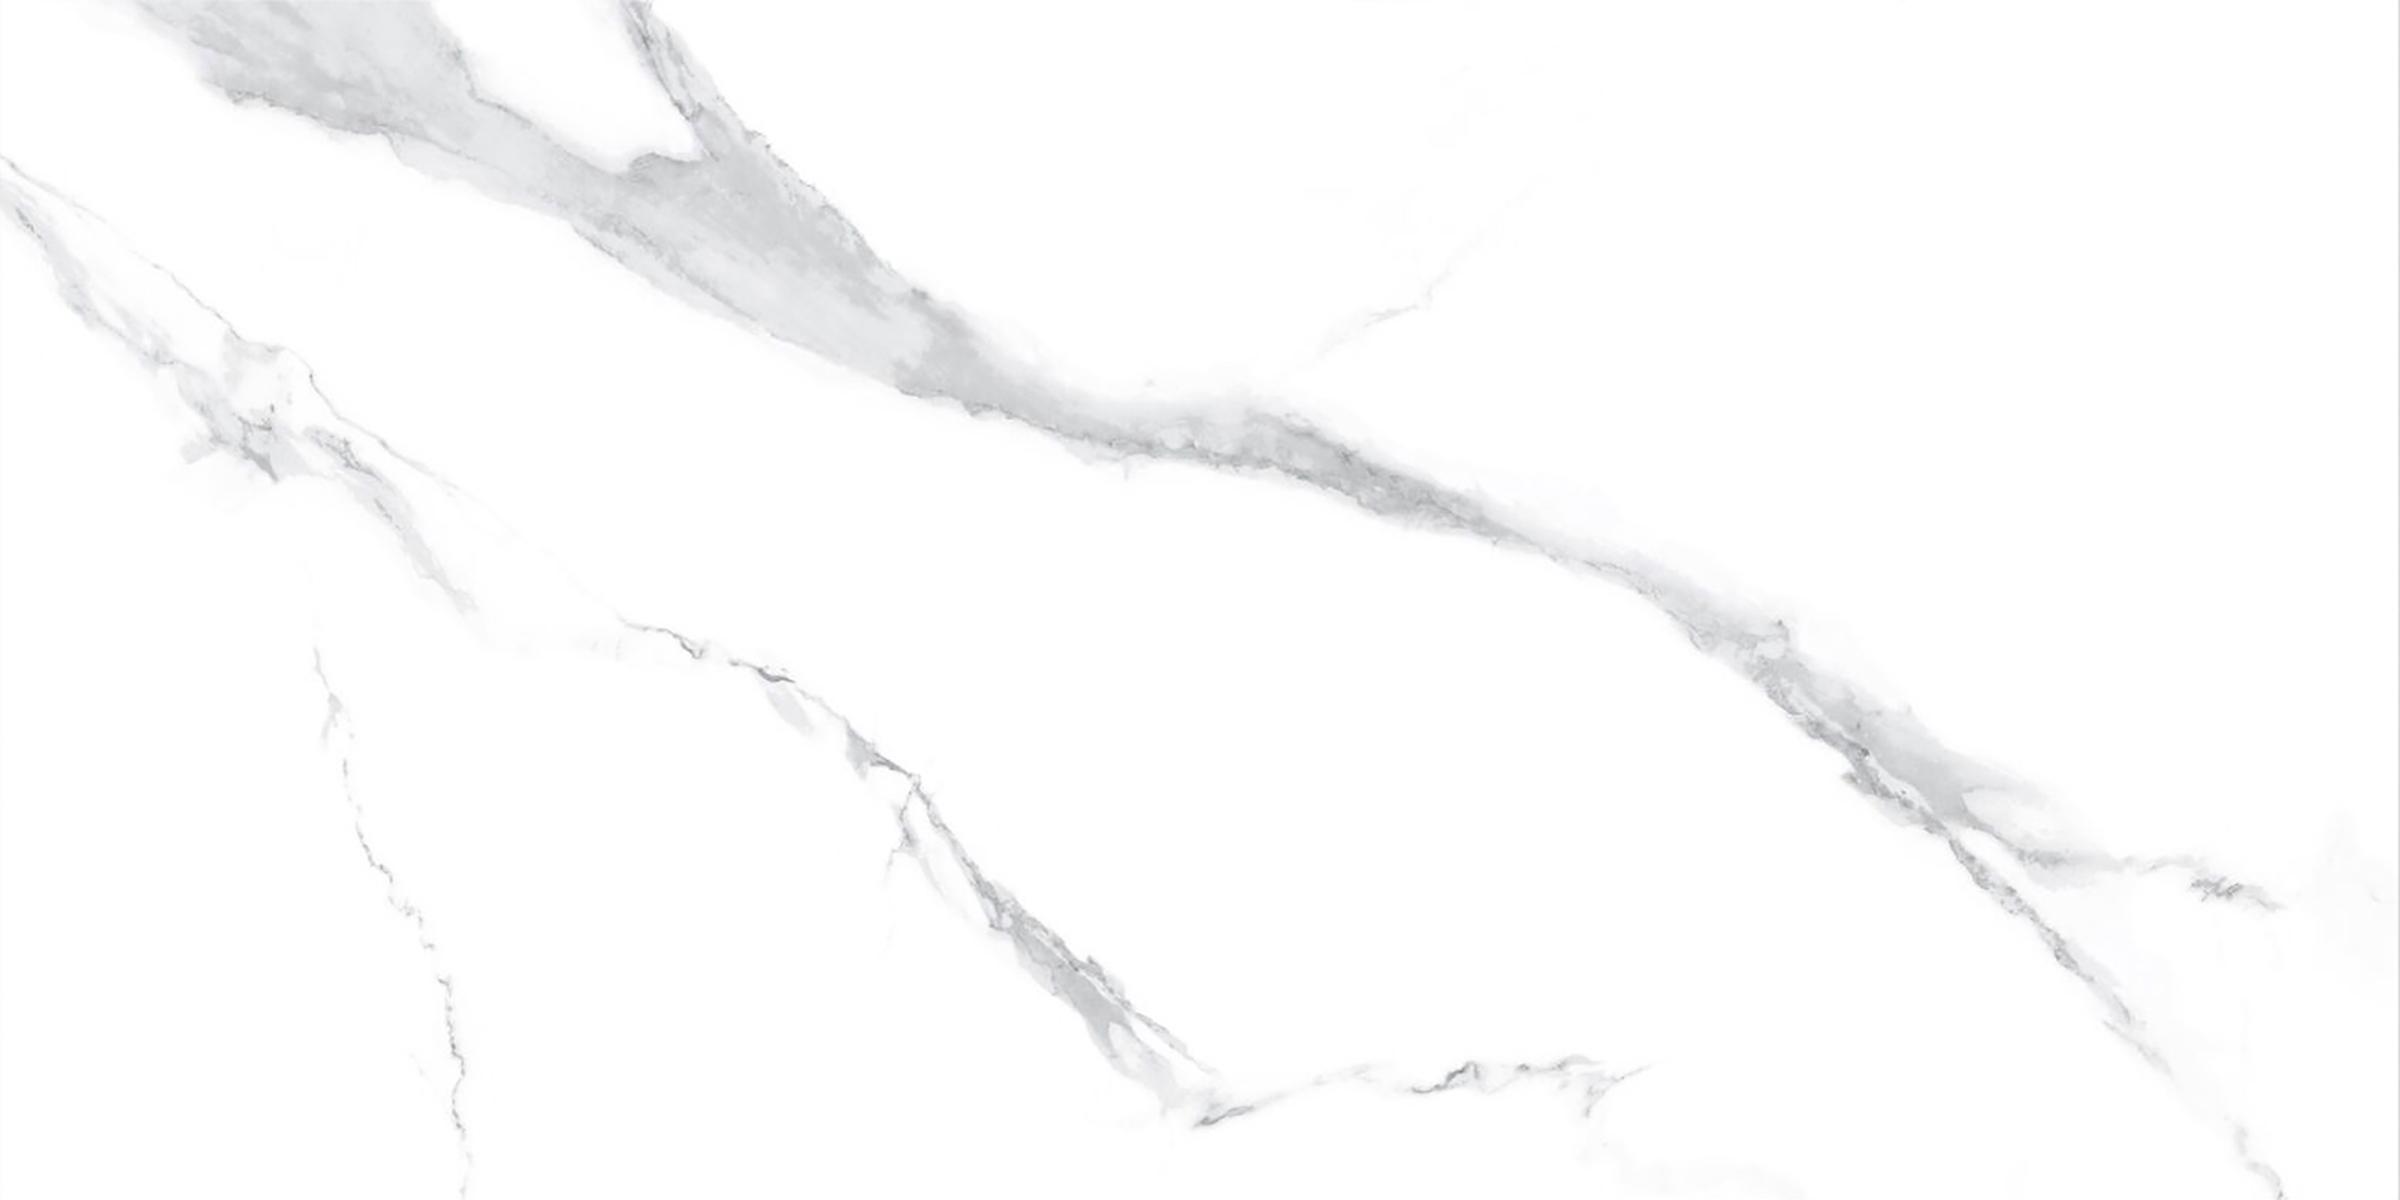 XZD126963